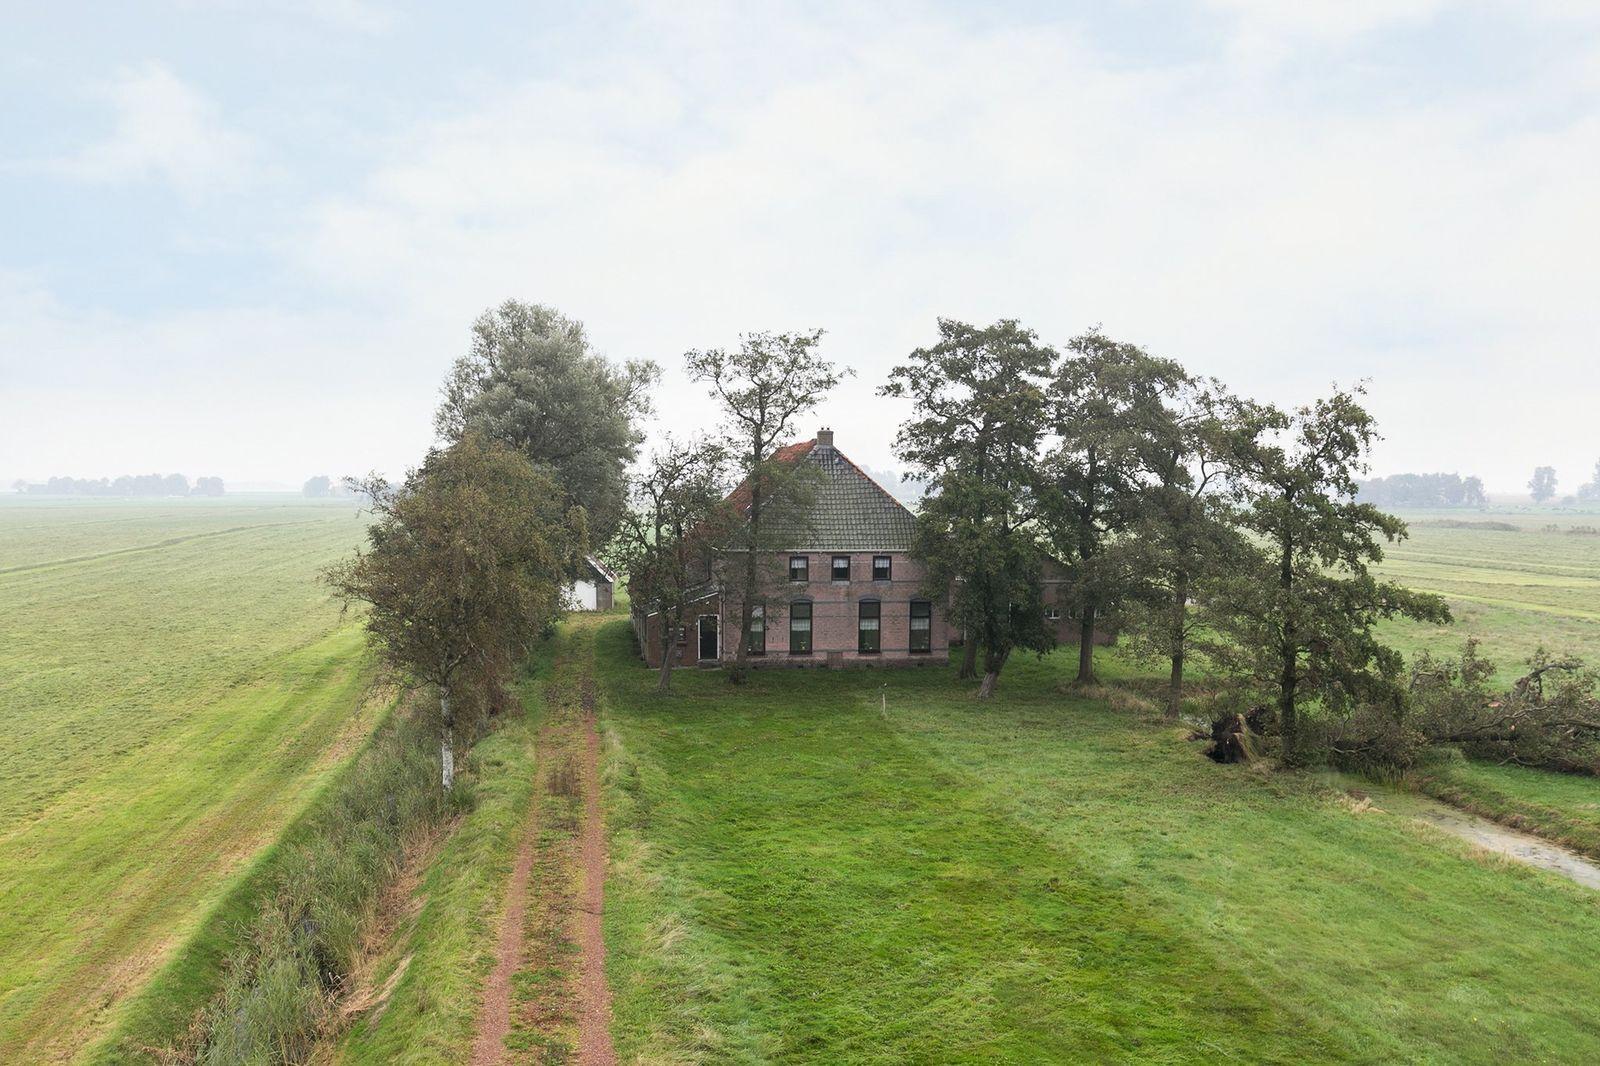 Holsteinpad 5, Oosterzee